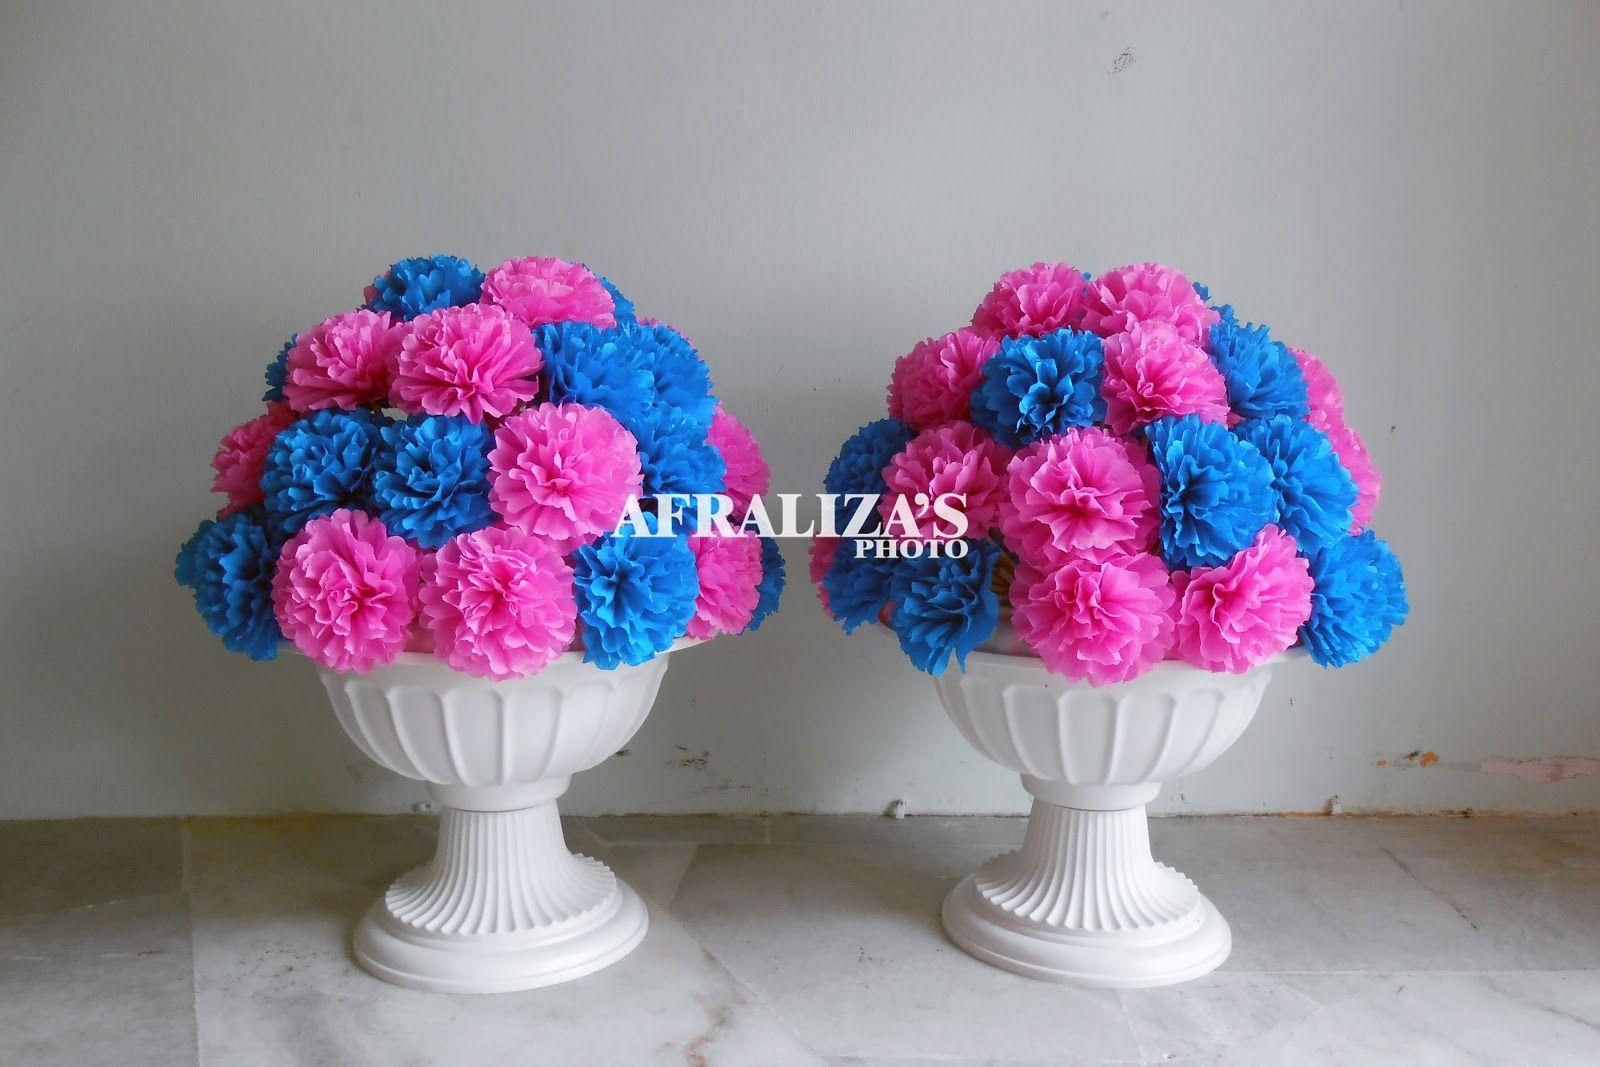 Diy Pasu Bunga Google Search Giant Paper Flowers Wedding Decorations